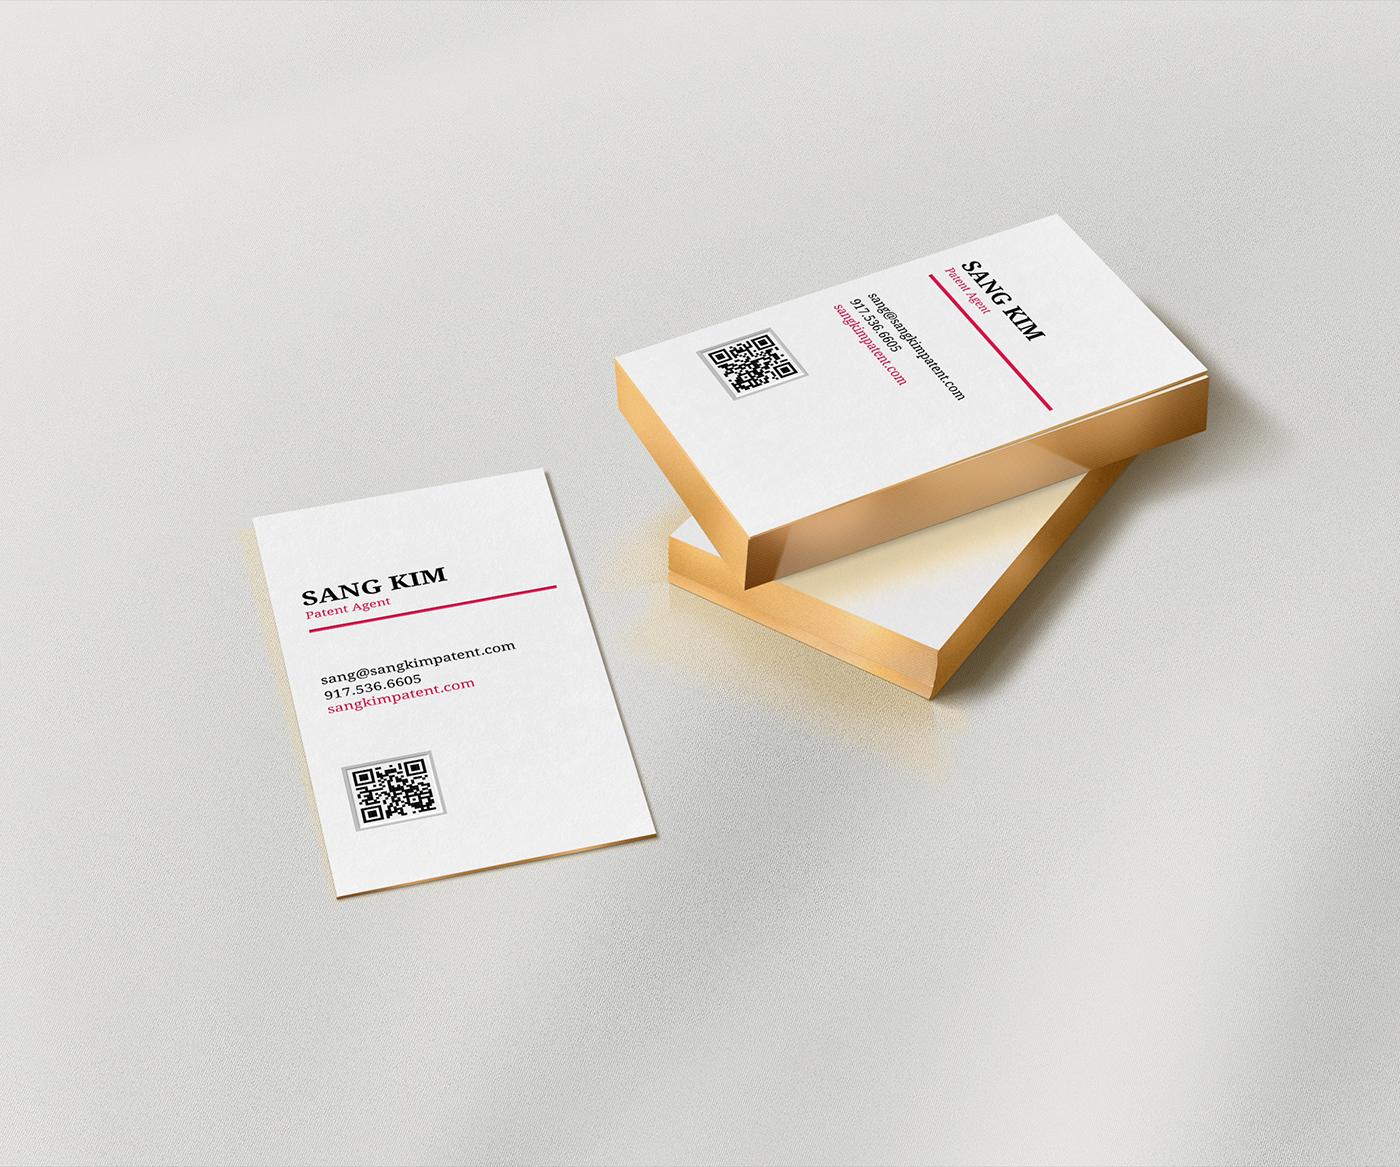 Sang Kim Business Card on Behance